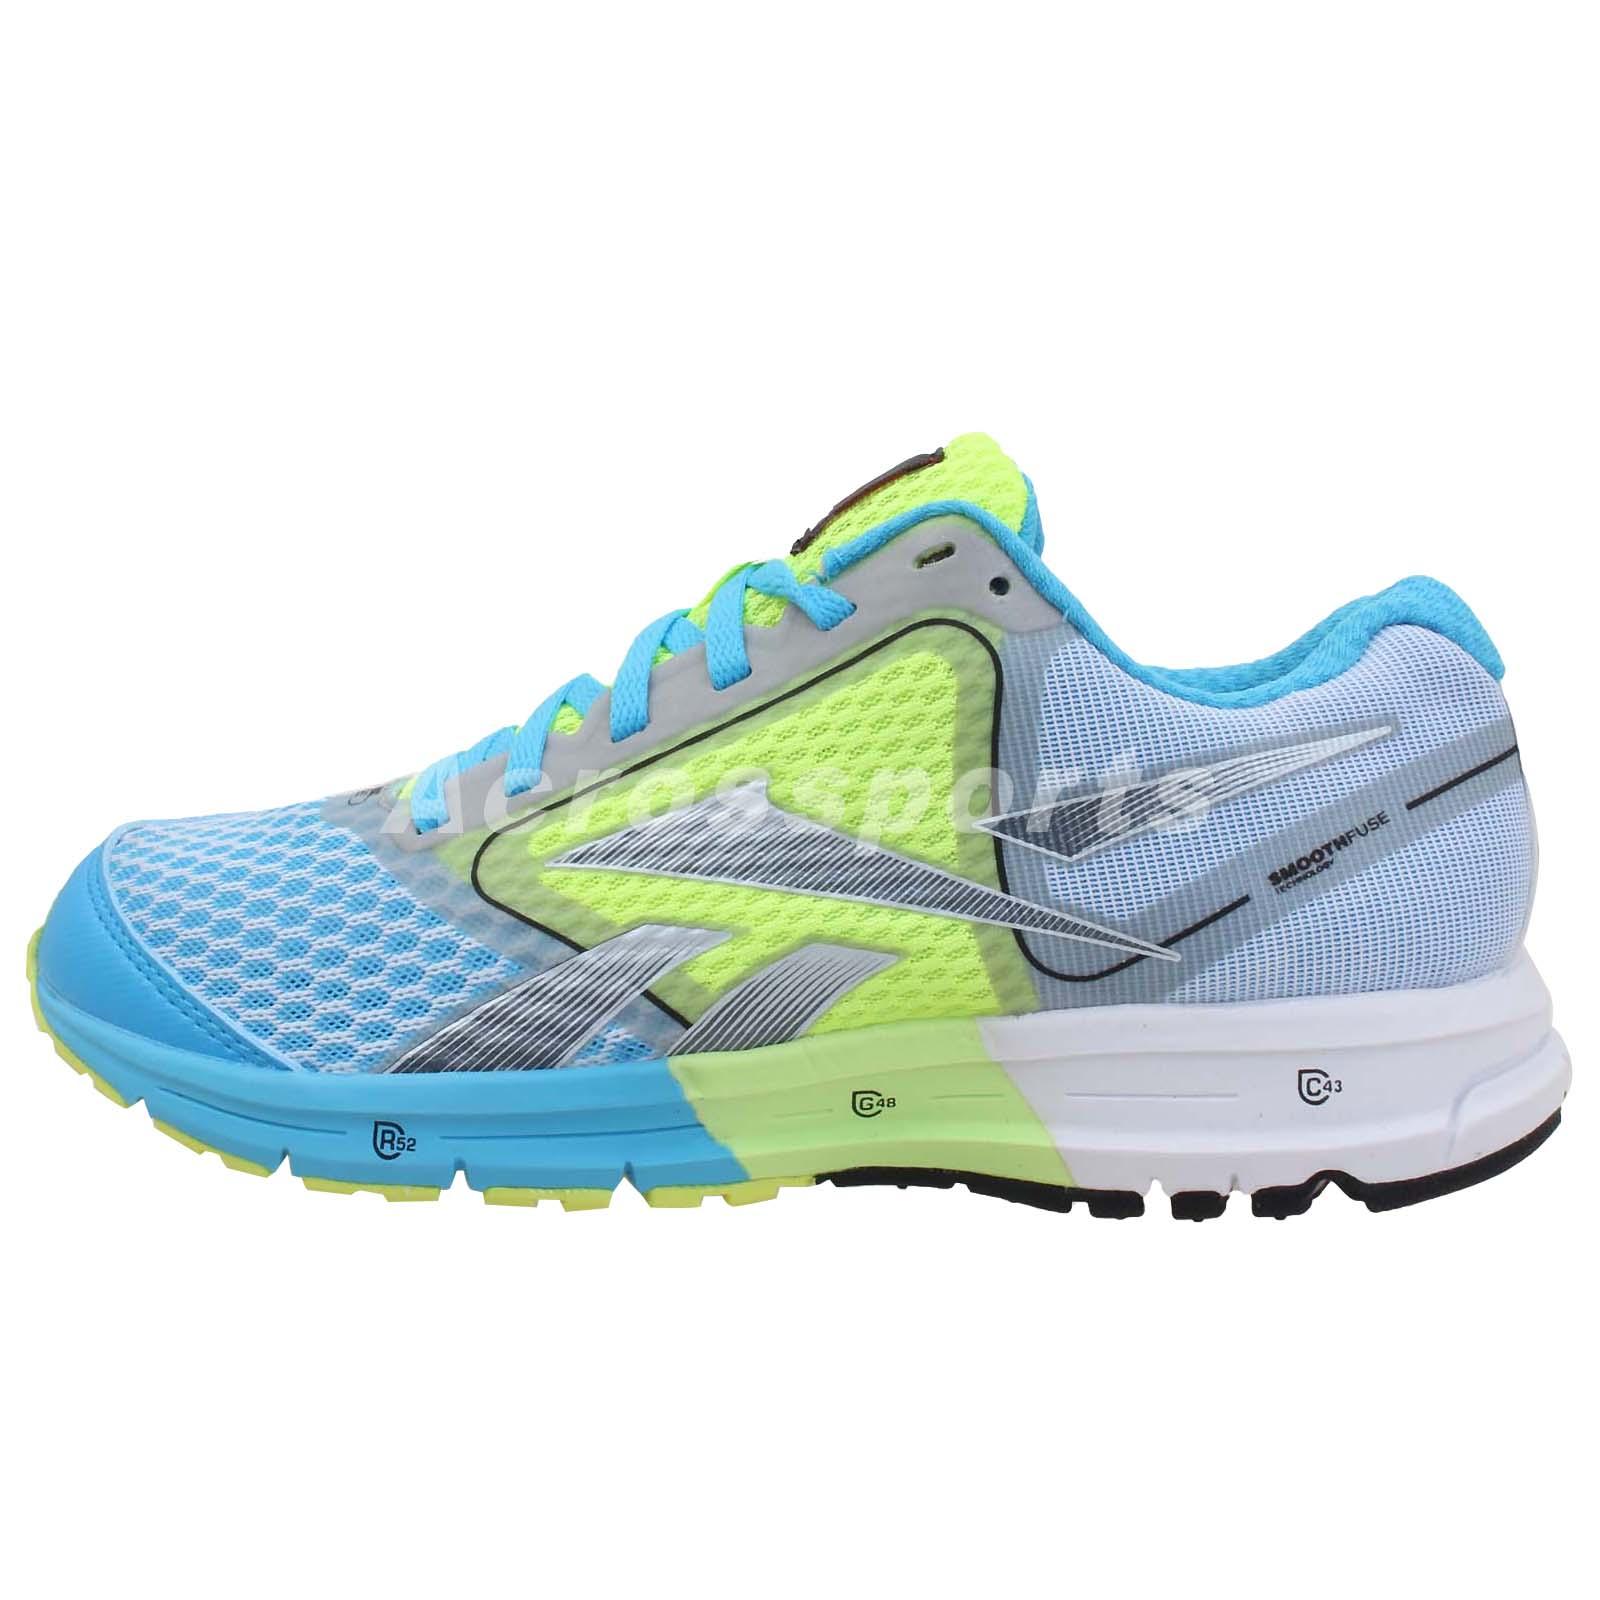 Reebok Running Shoes 2013 Reebok One Guide Yello...